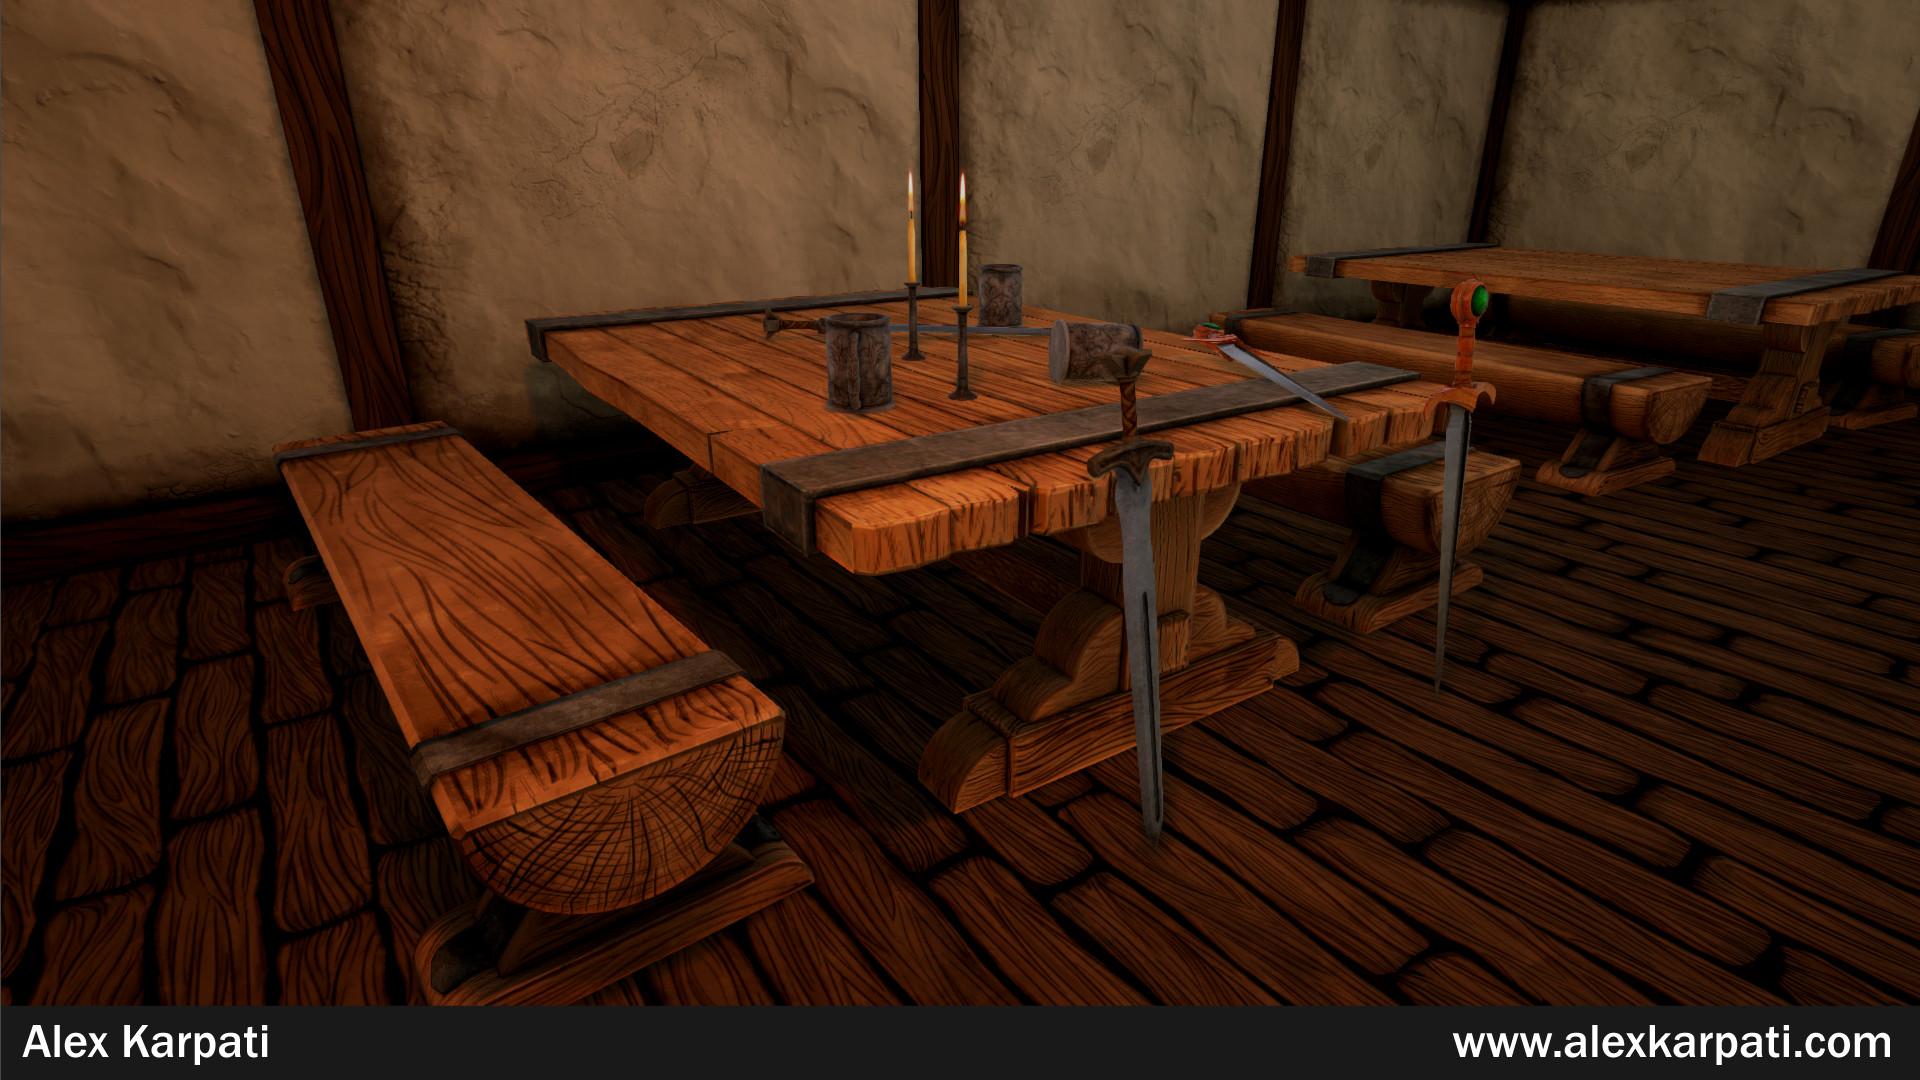 Alex karpati tavern 02 v01